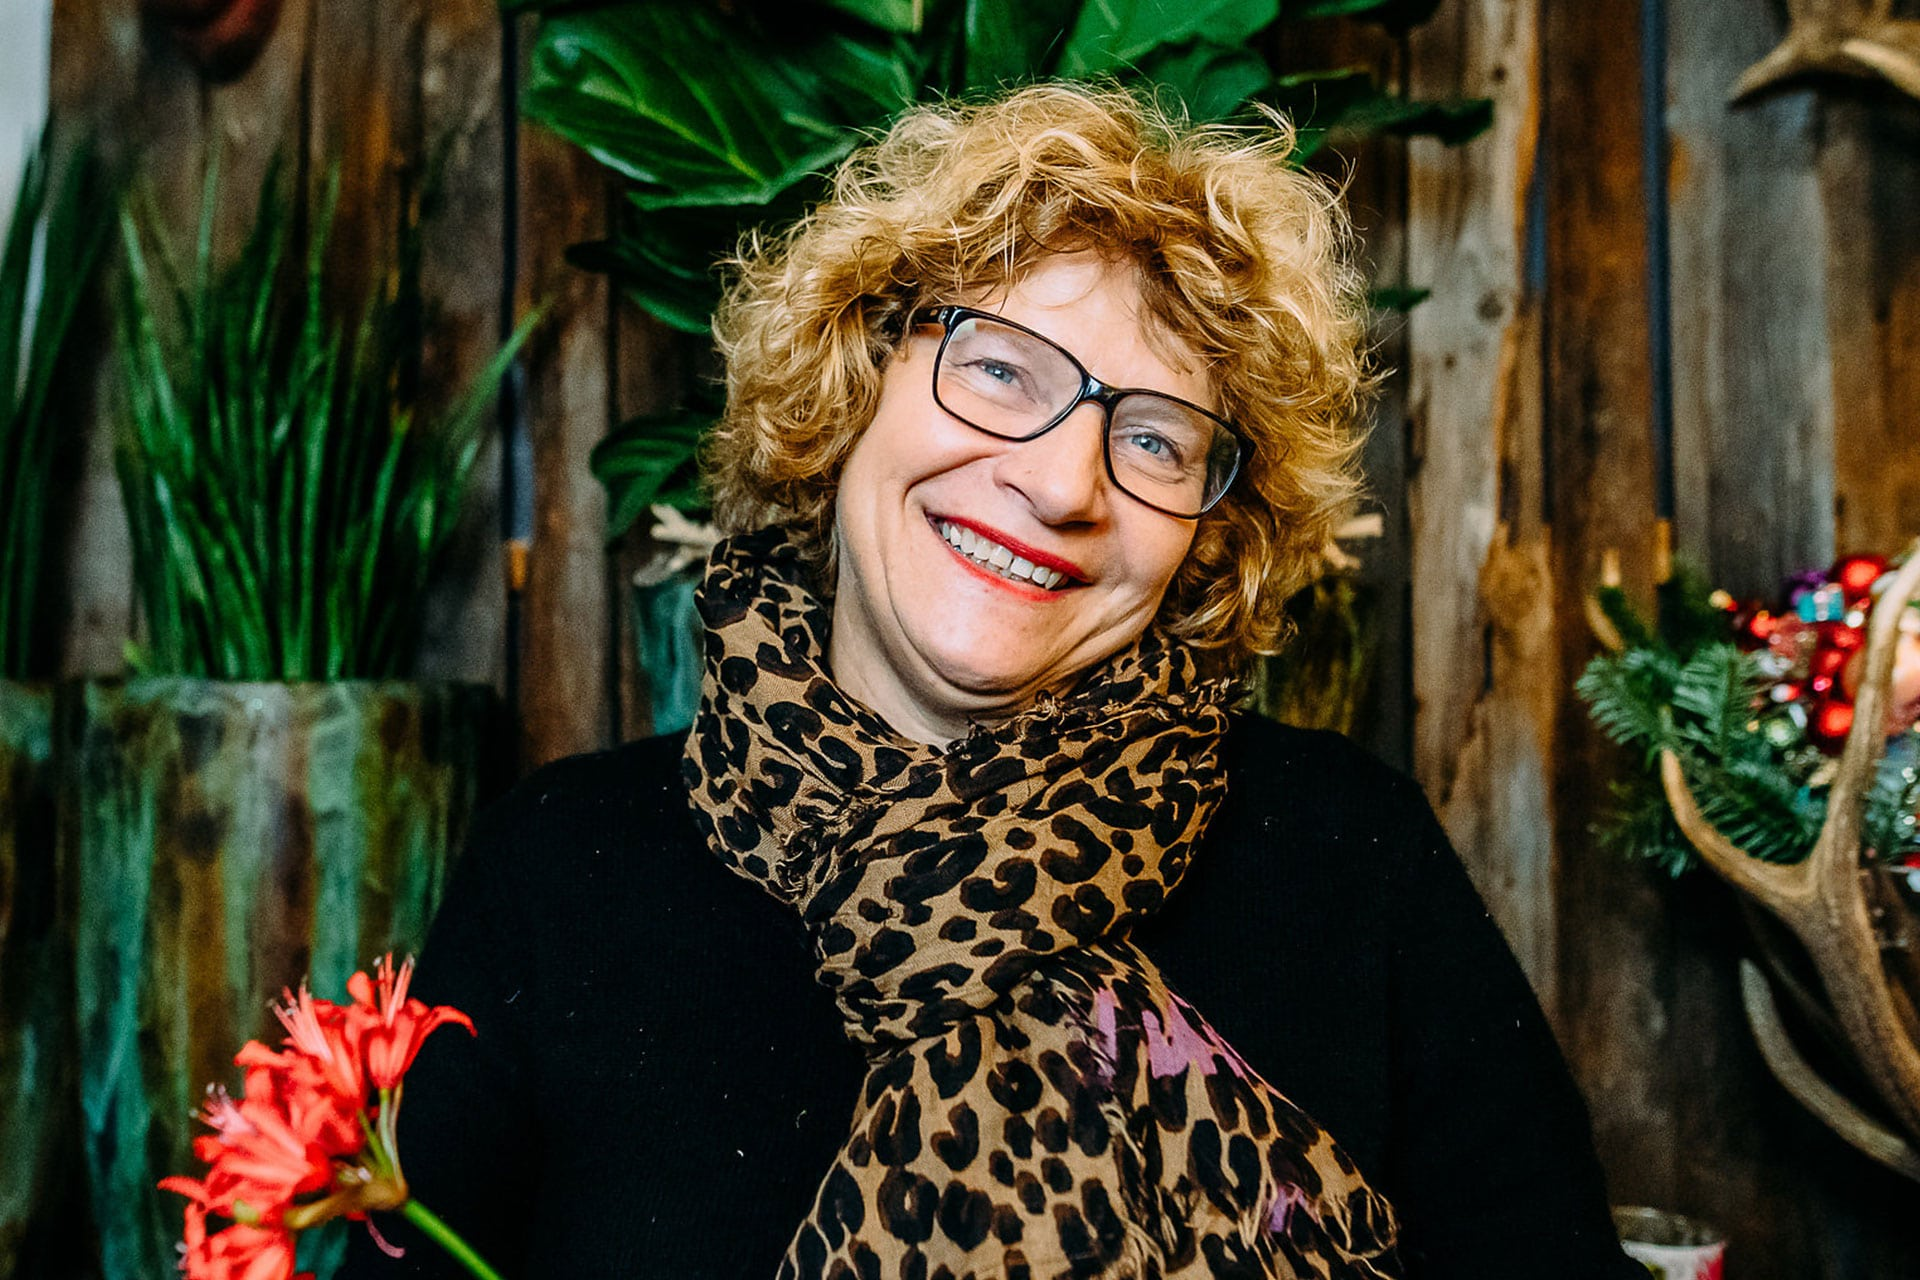 Karin Engel